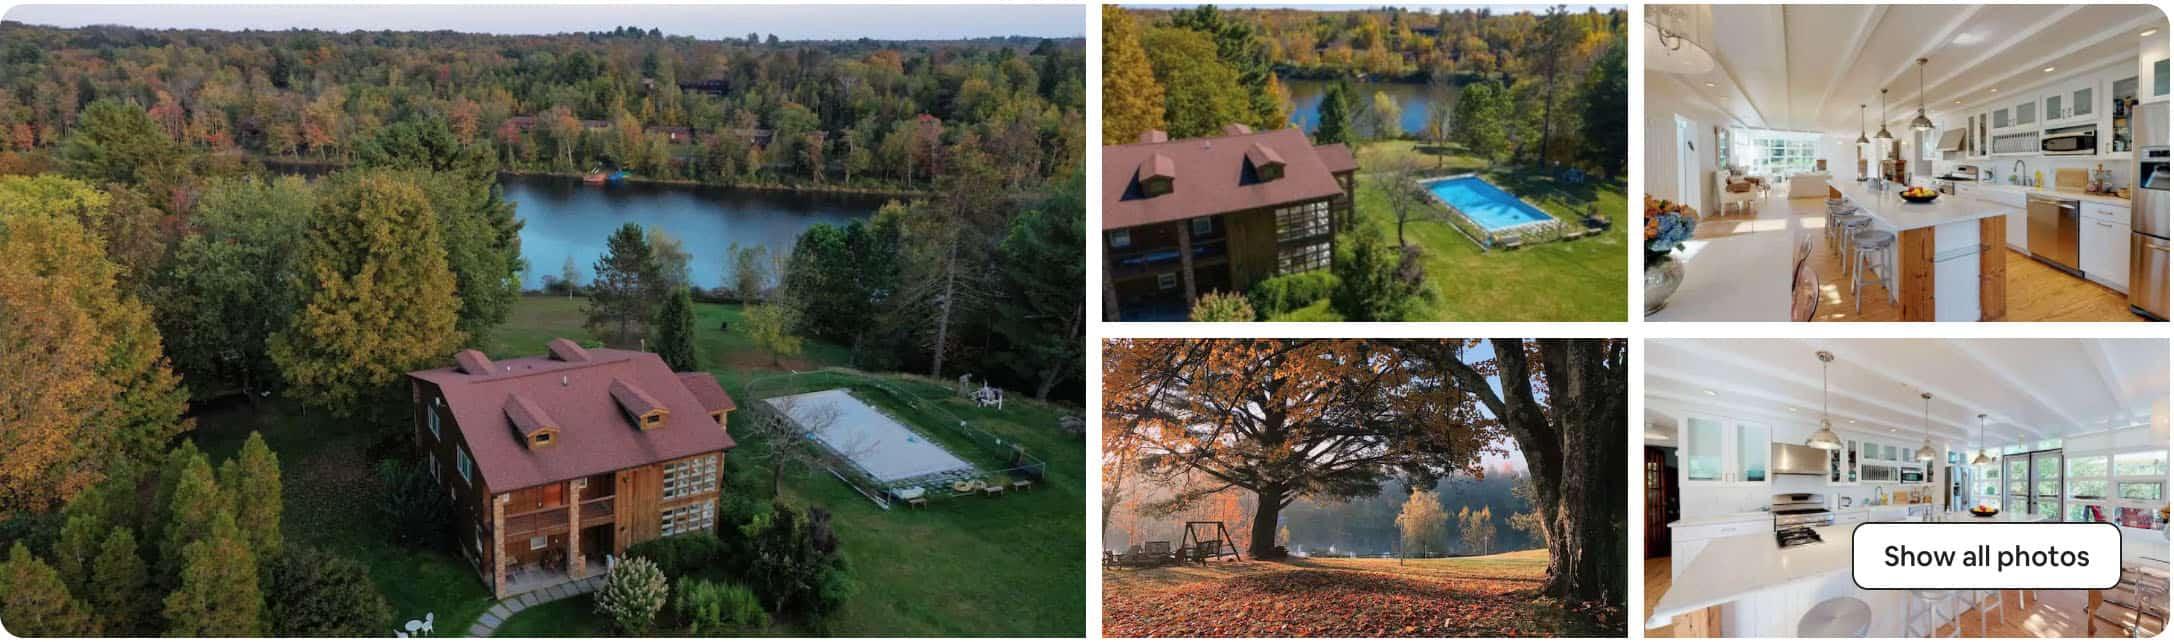 Catskills Airbnb on Swan Lake